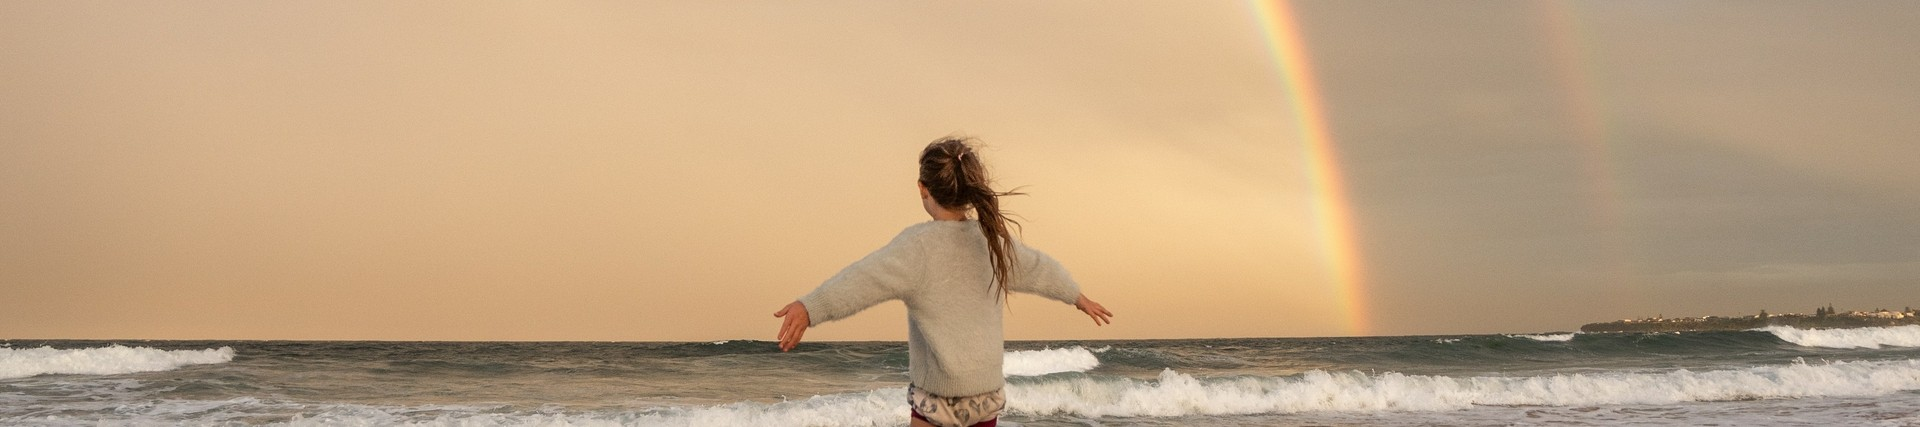 Anonymous woman on beach with rainbow